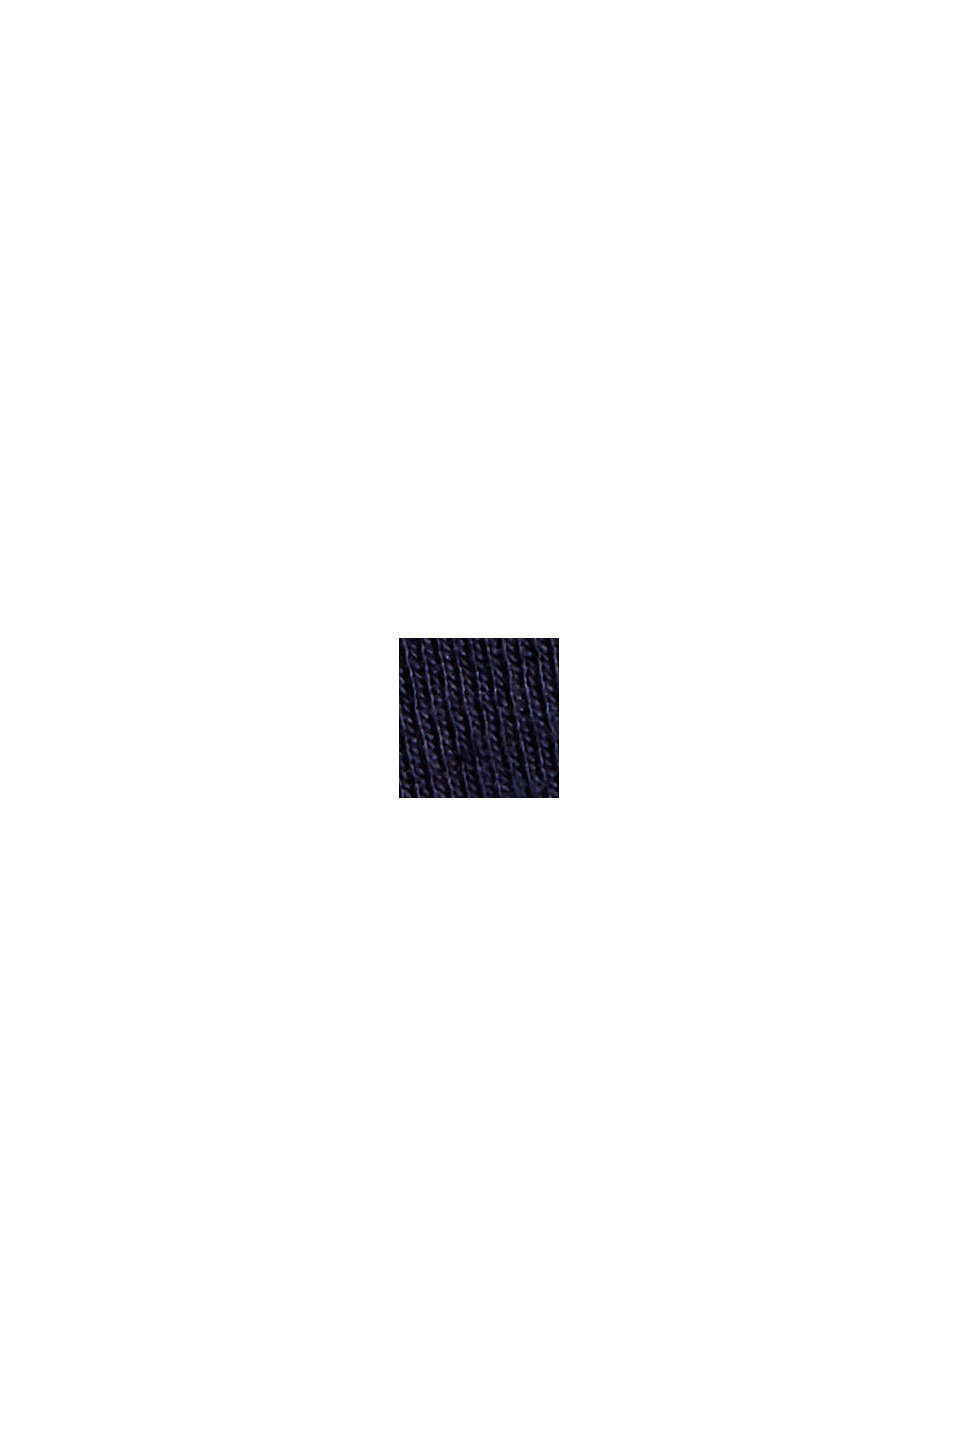 T-shirt à manches longues à rayures, 100% coton, NAVY, swatch